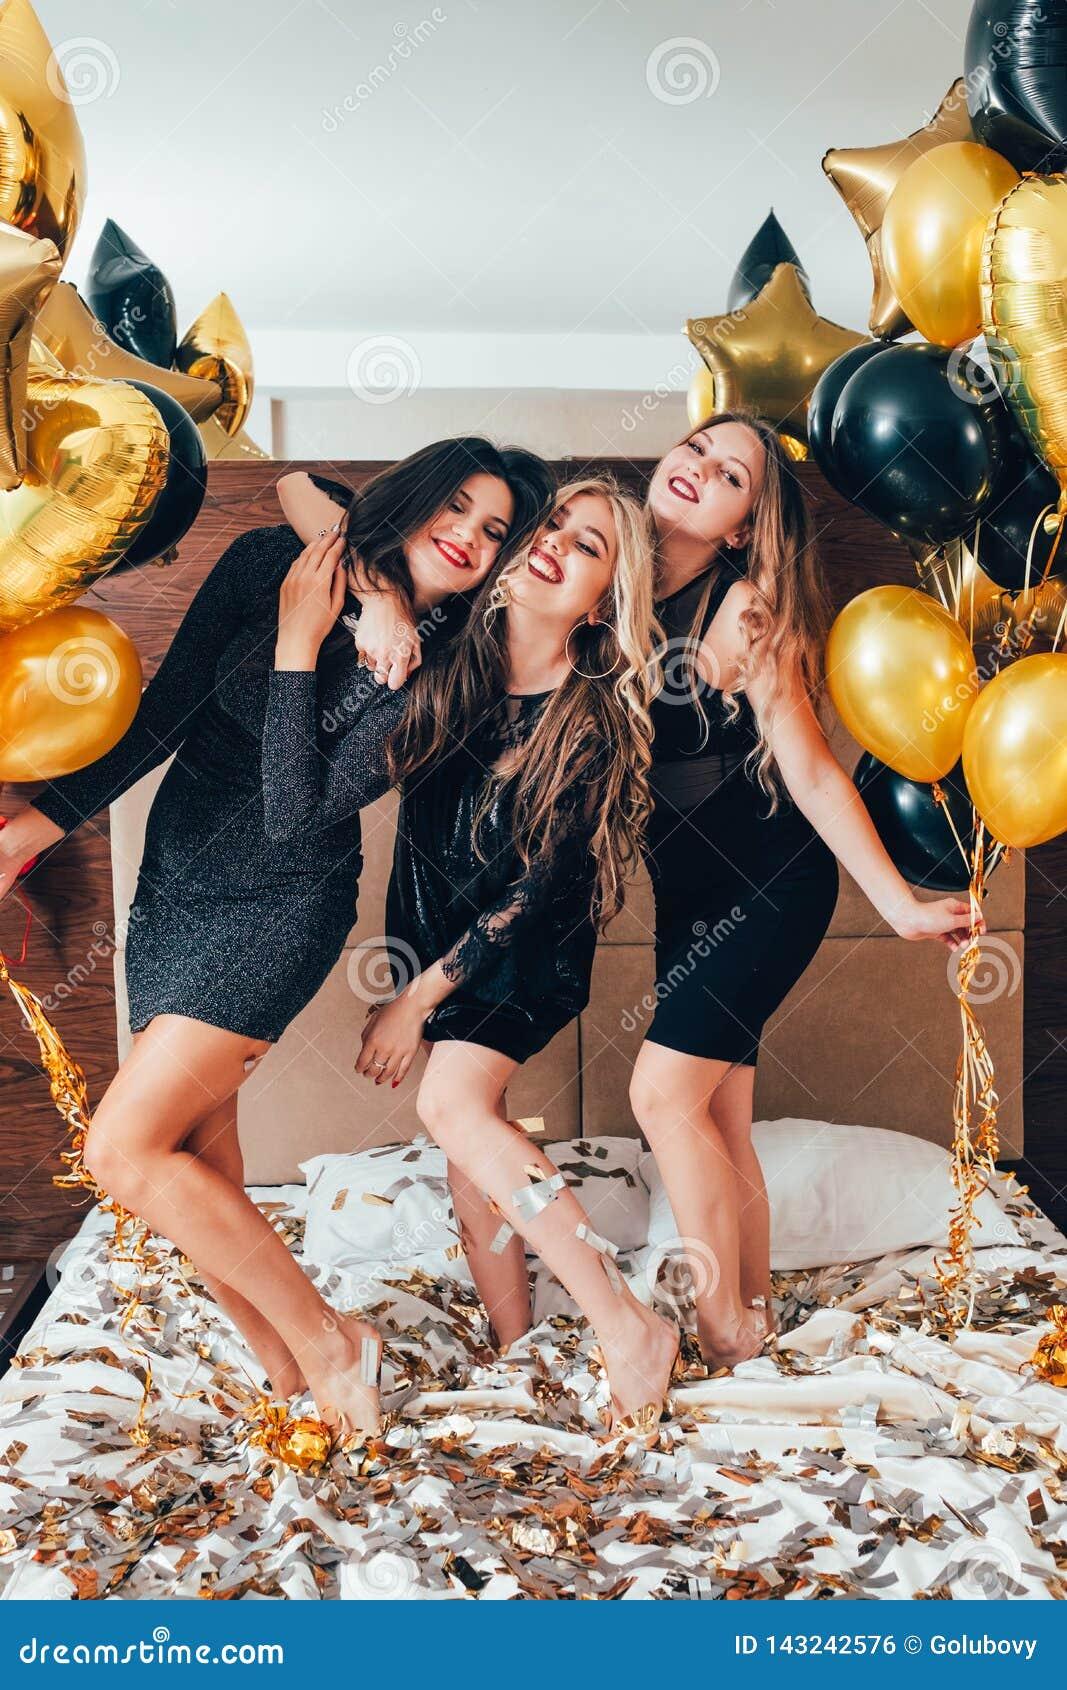 Bff hangout urban girls leisure lifestyle confetti